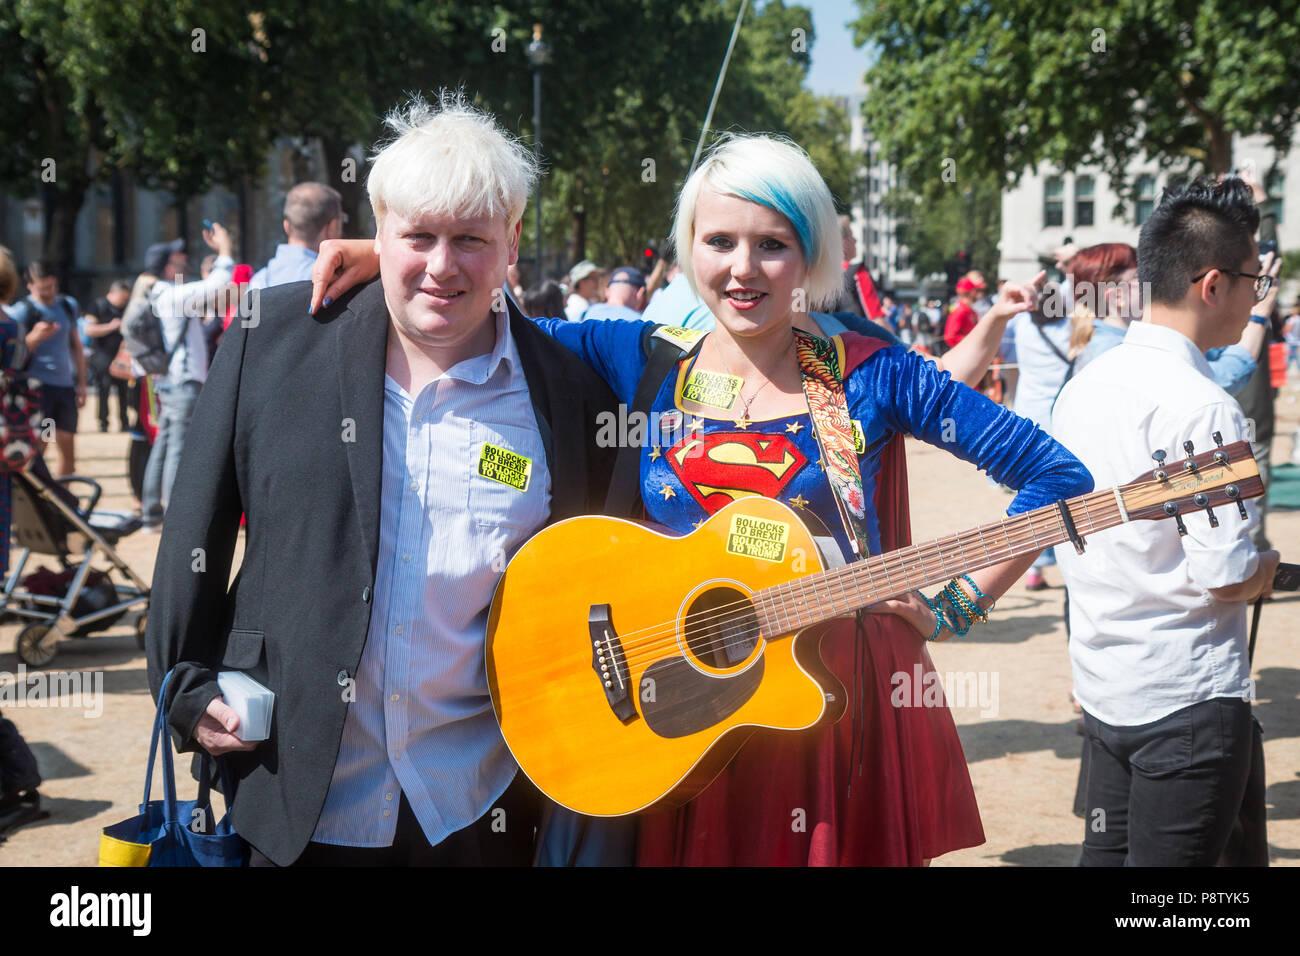 London, UK. 13th July, 2018. Boris Johnson and 'EU Supergirl' Madeleina Kay in Parliament Square Credit: Zefrog/Alamy Live News - Stock Image